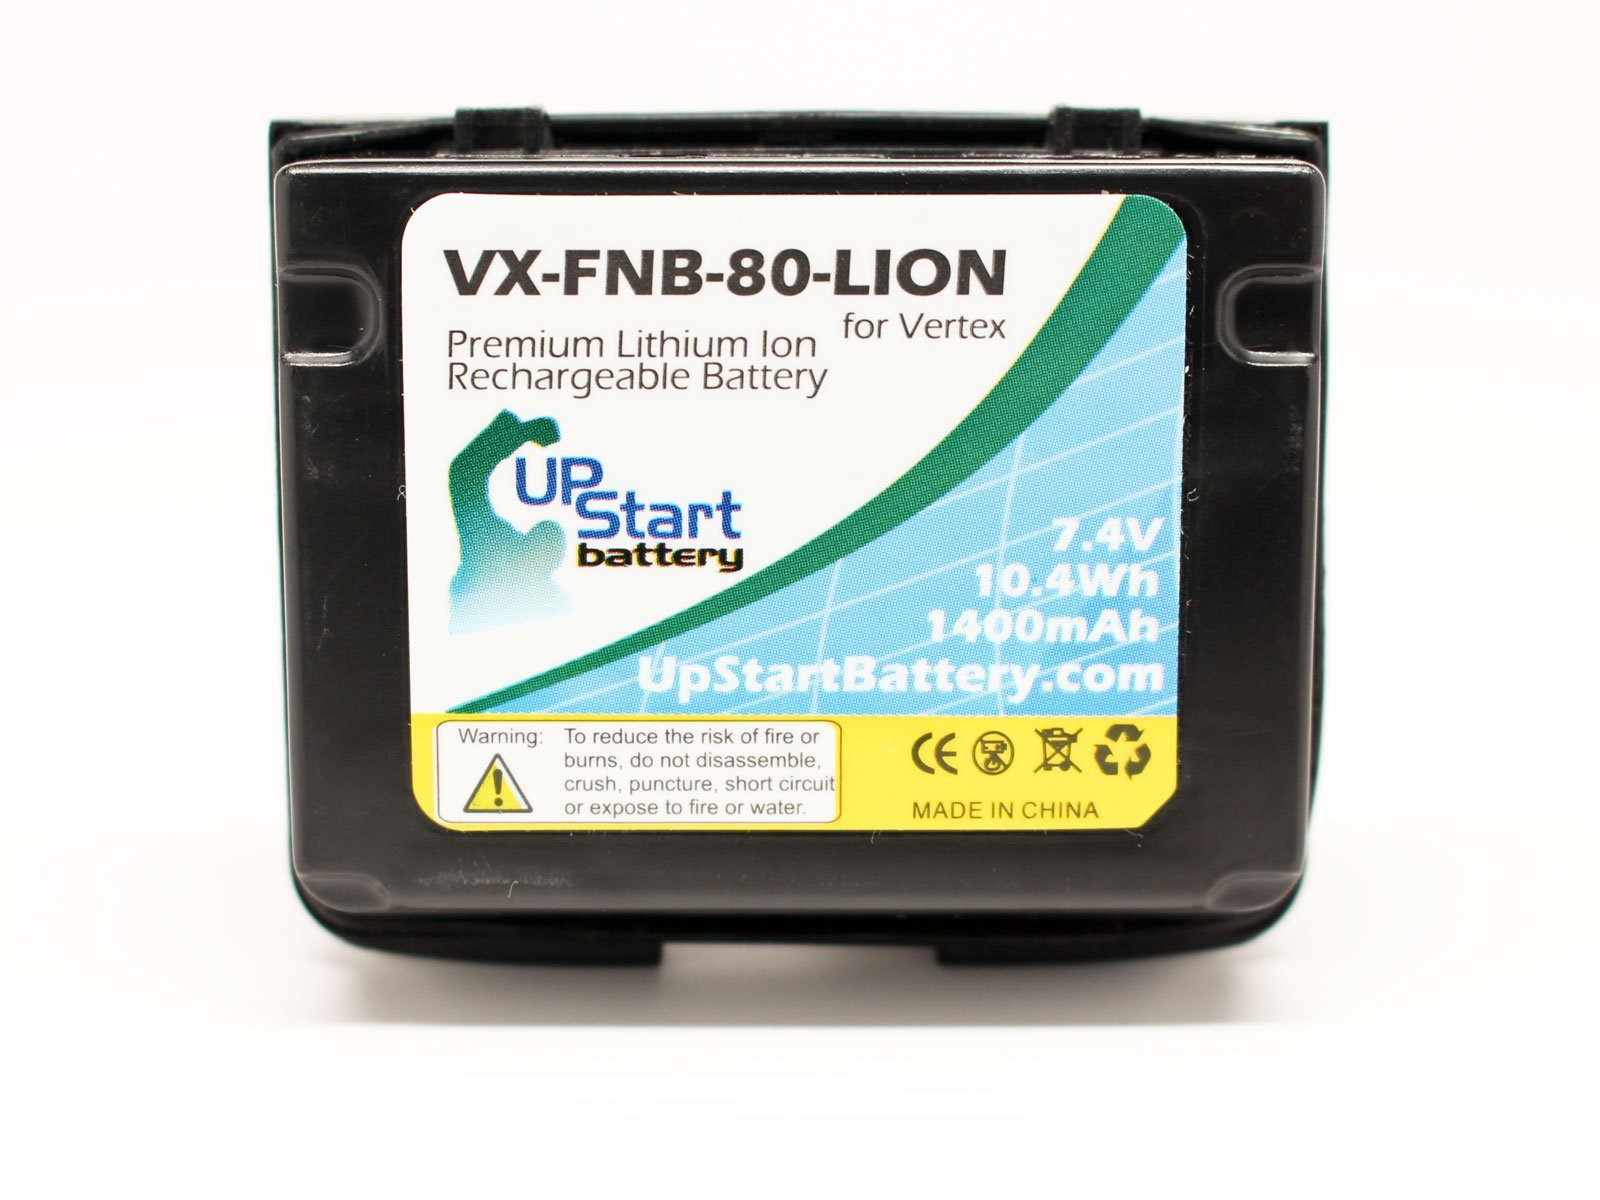 Vertex VXA-710 Battery - Replacement for Vertex FNB-80Li Two-Way Radio Battery (1400mAh, 7.4V, Lithium-Ion)